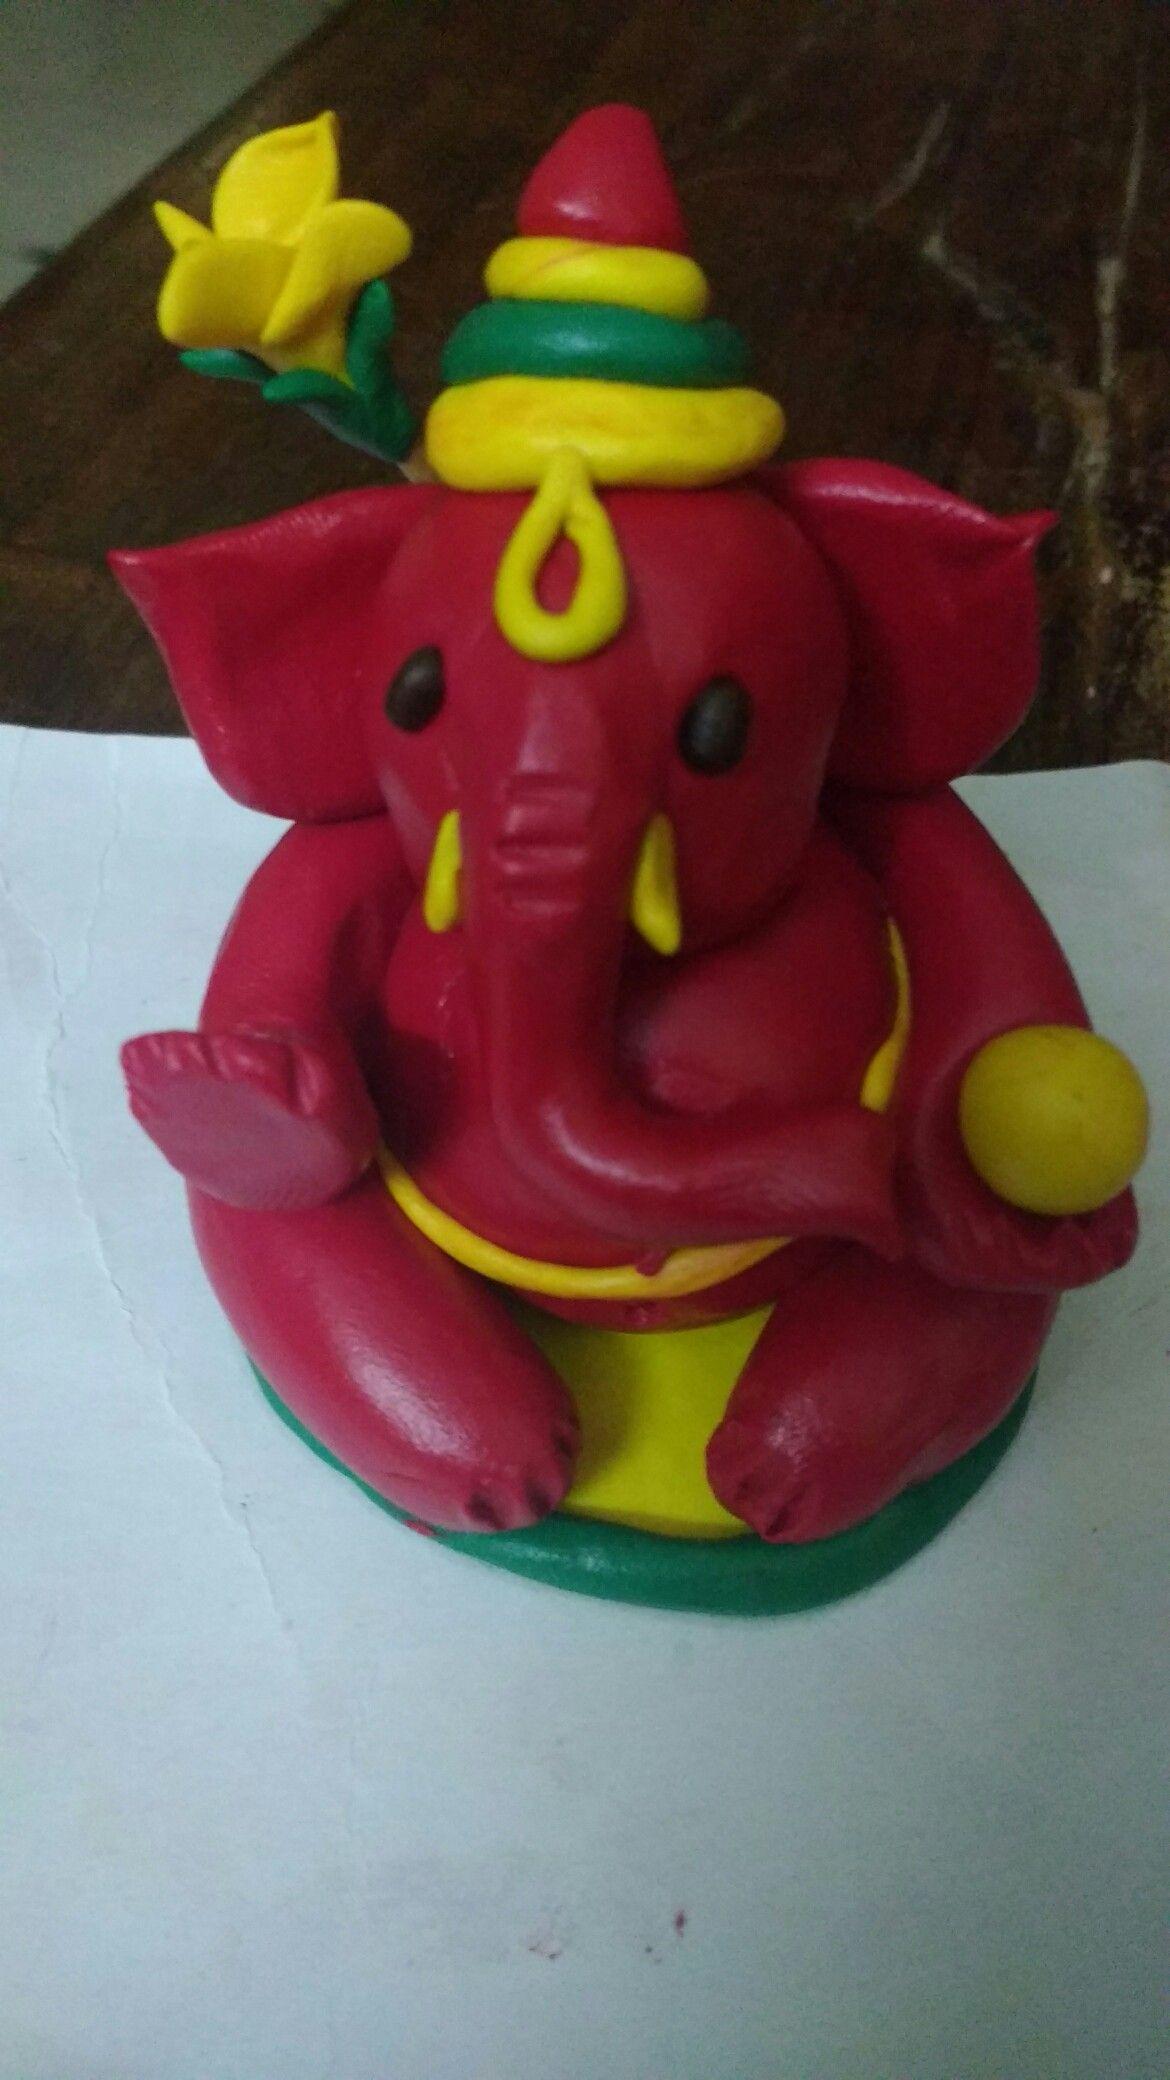 clay ganesh idol clay ganesh idol | projects to try | pinterest